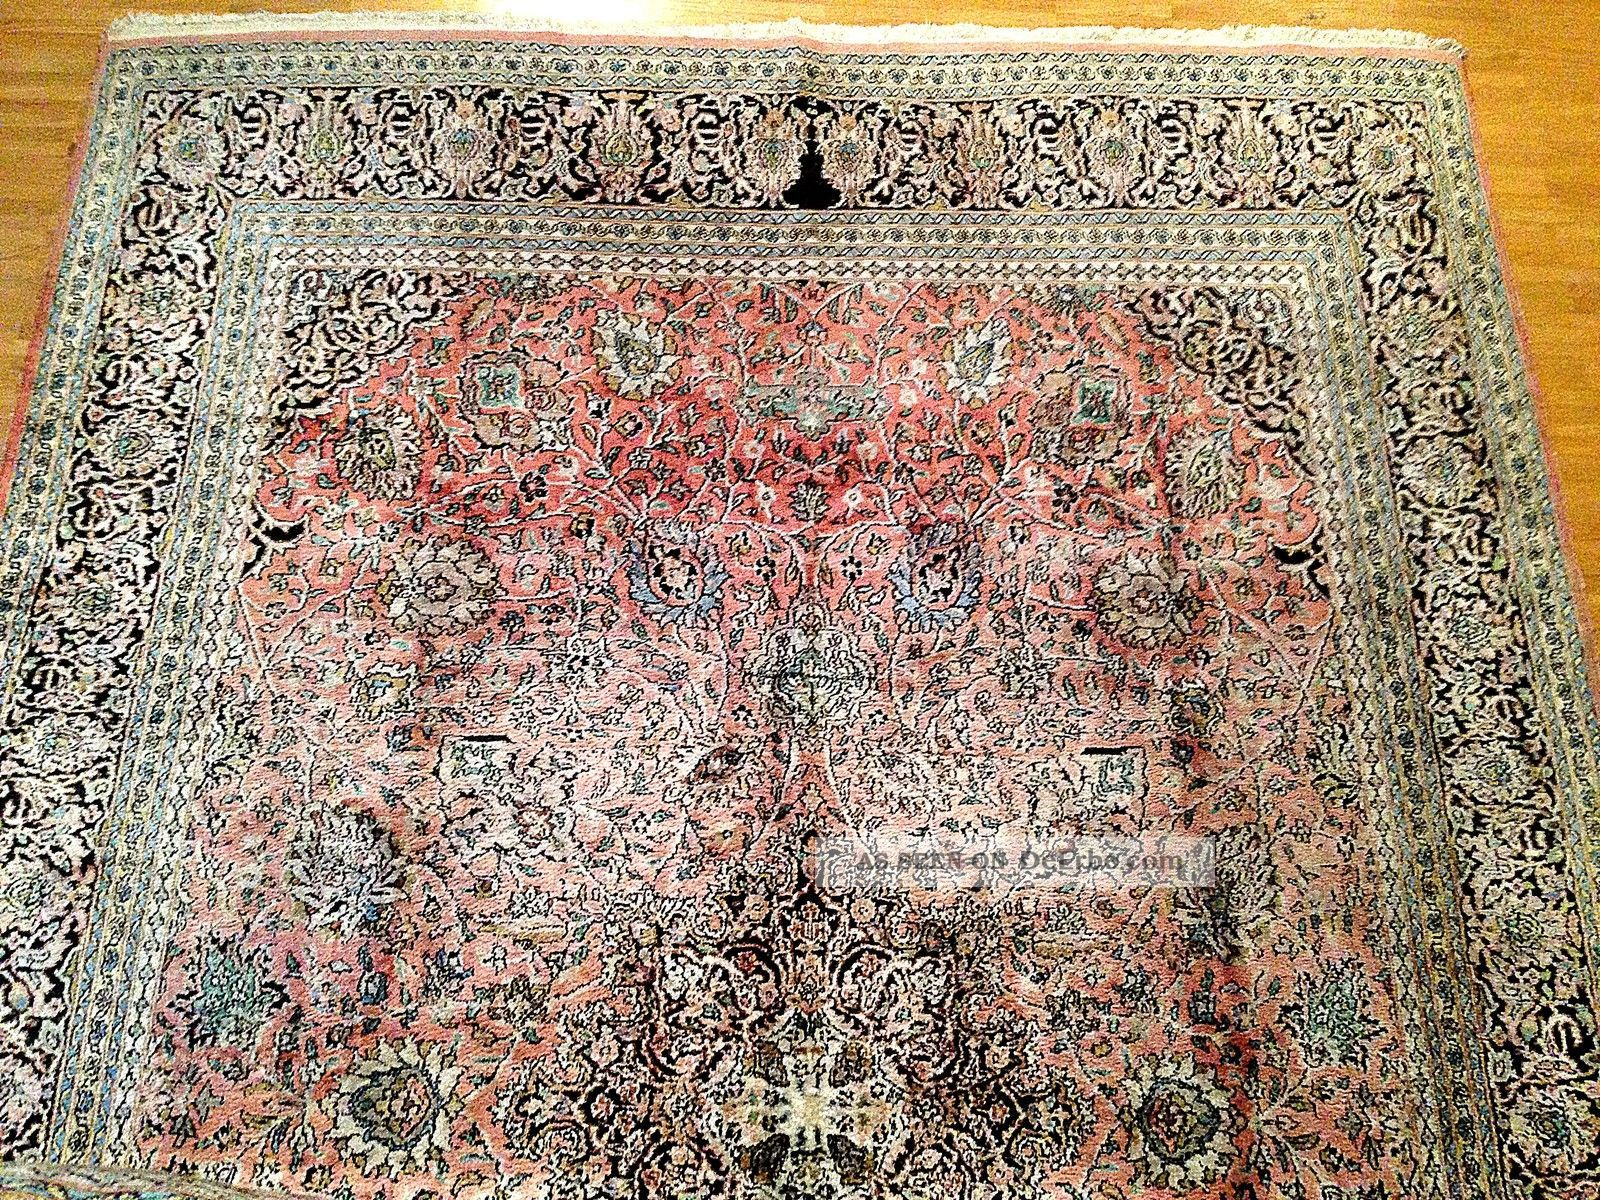 Teppich Handgeknüpft Kaschmir Seide Natur275x175cm Carpet